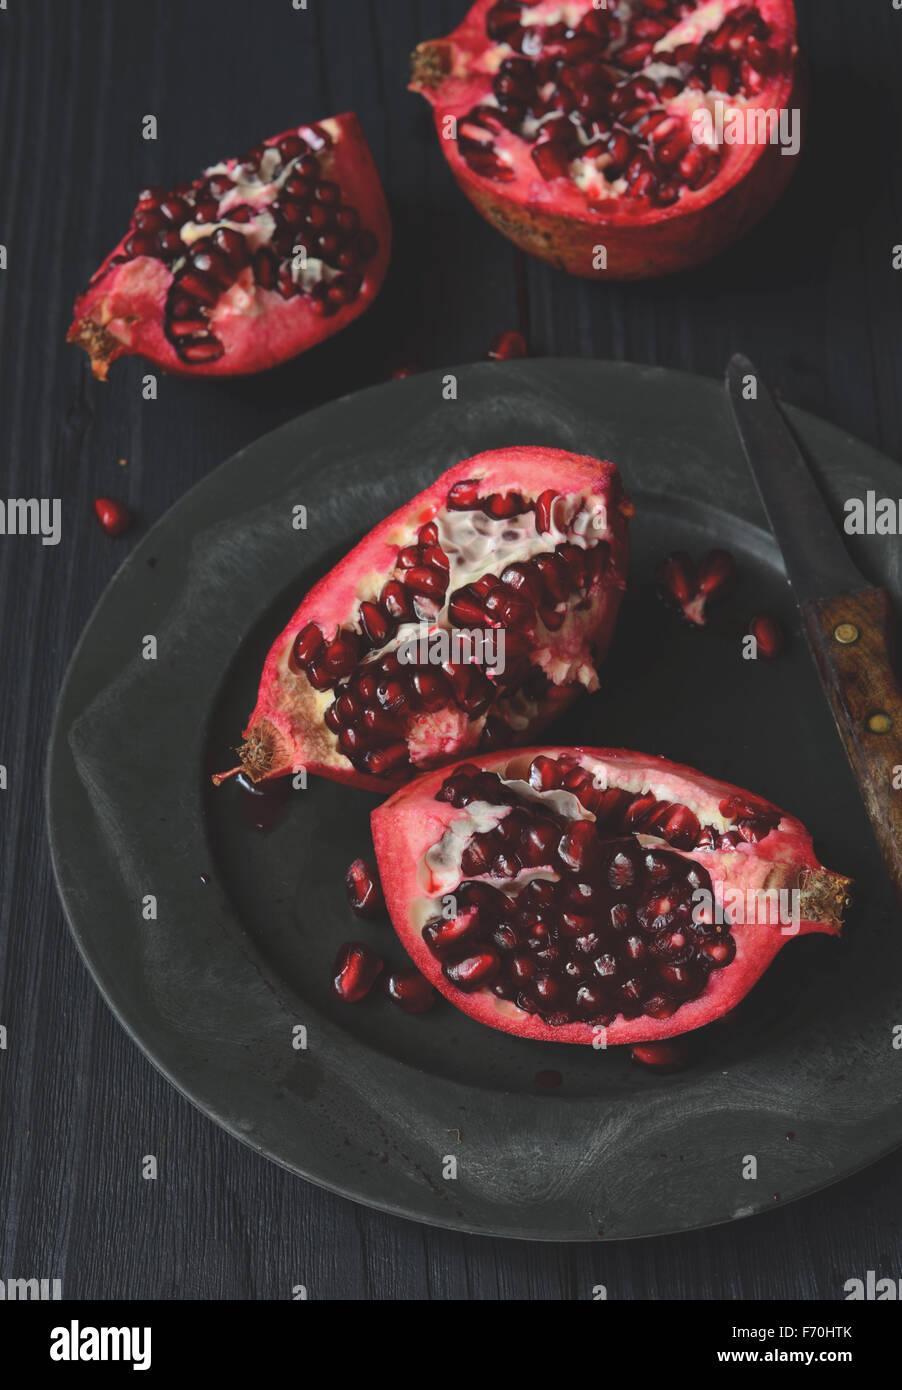 Stücke und Körner reif Granatapfel-Frucht Stockbild